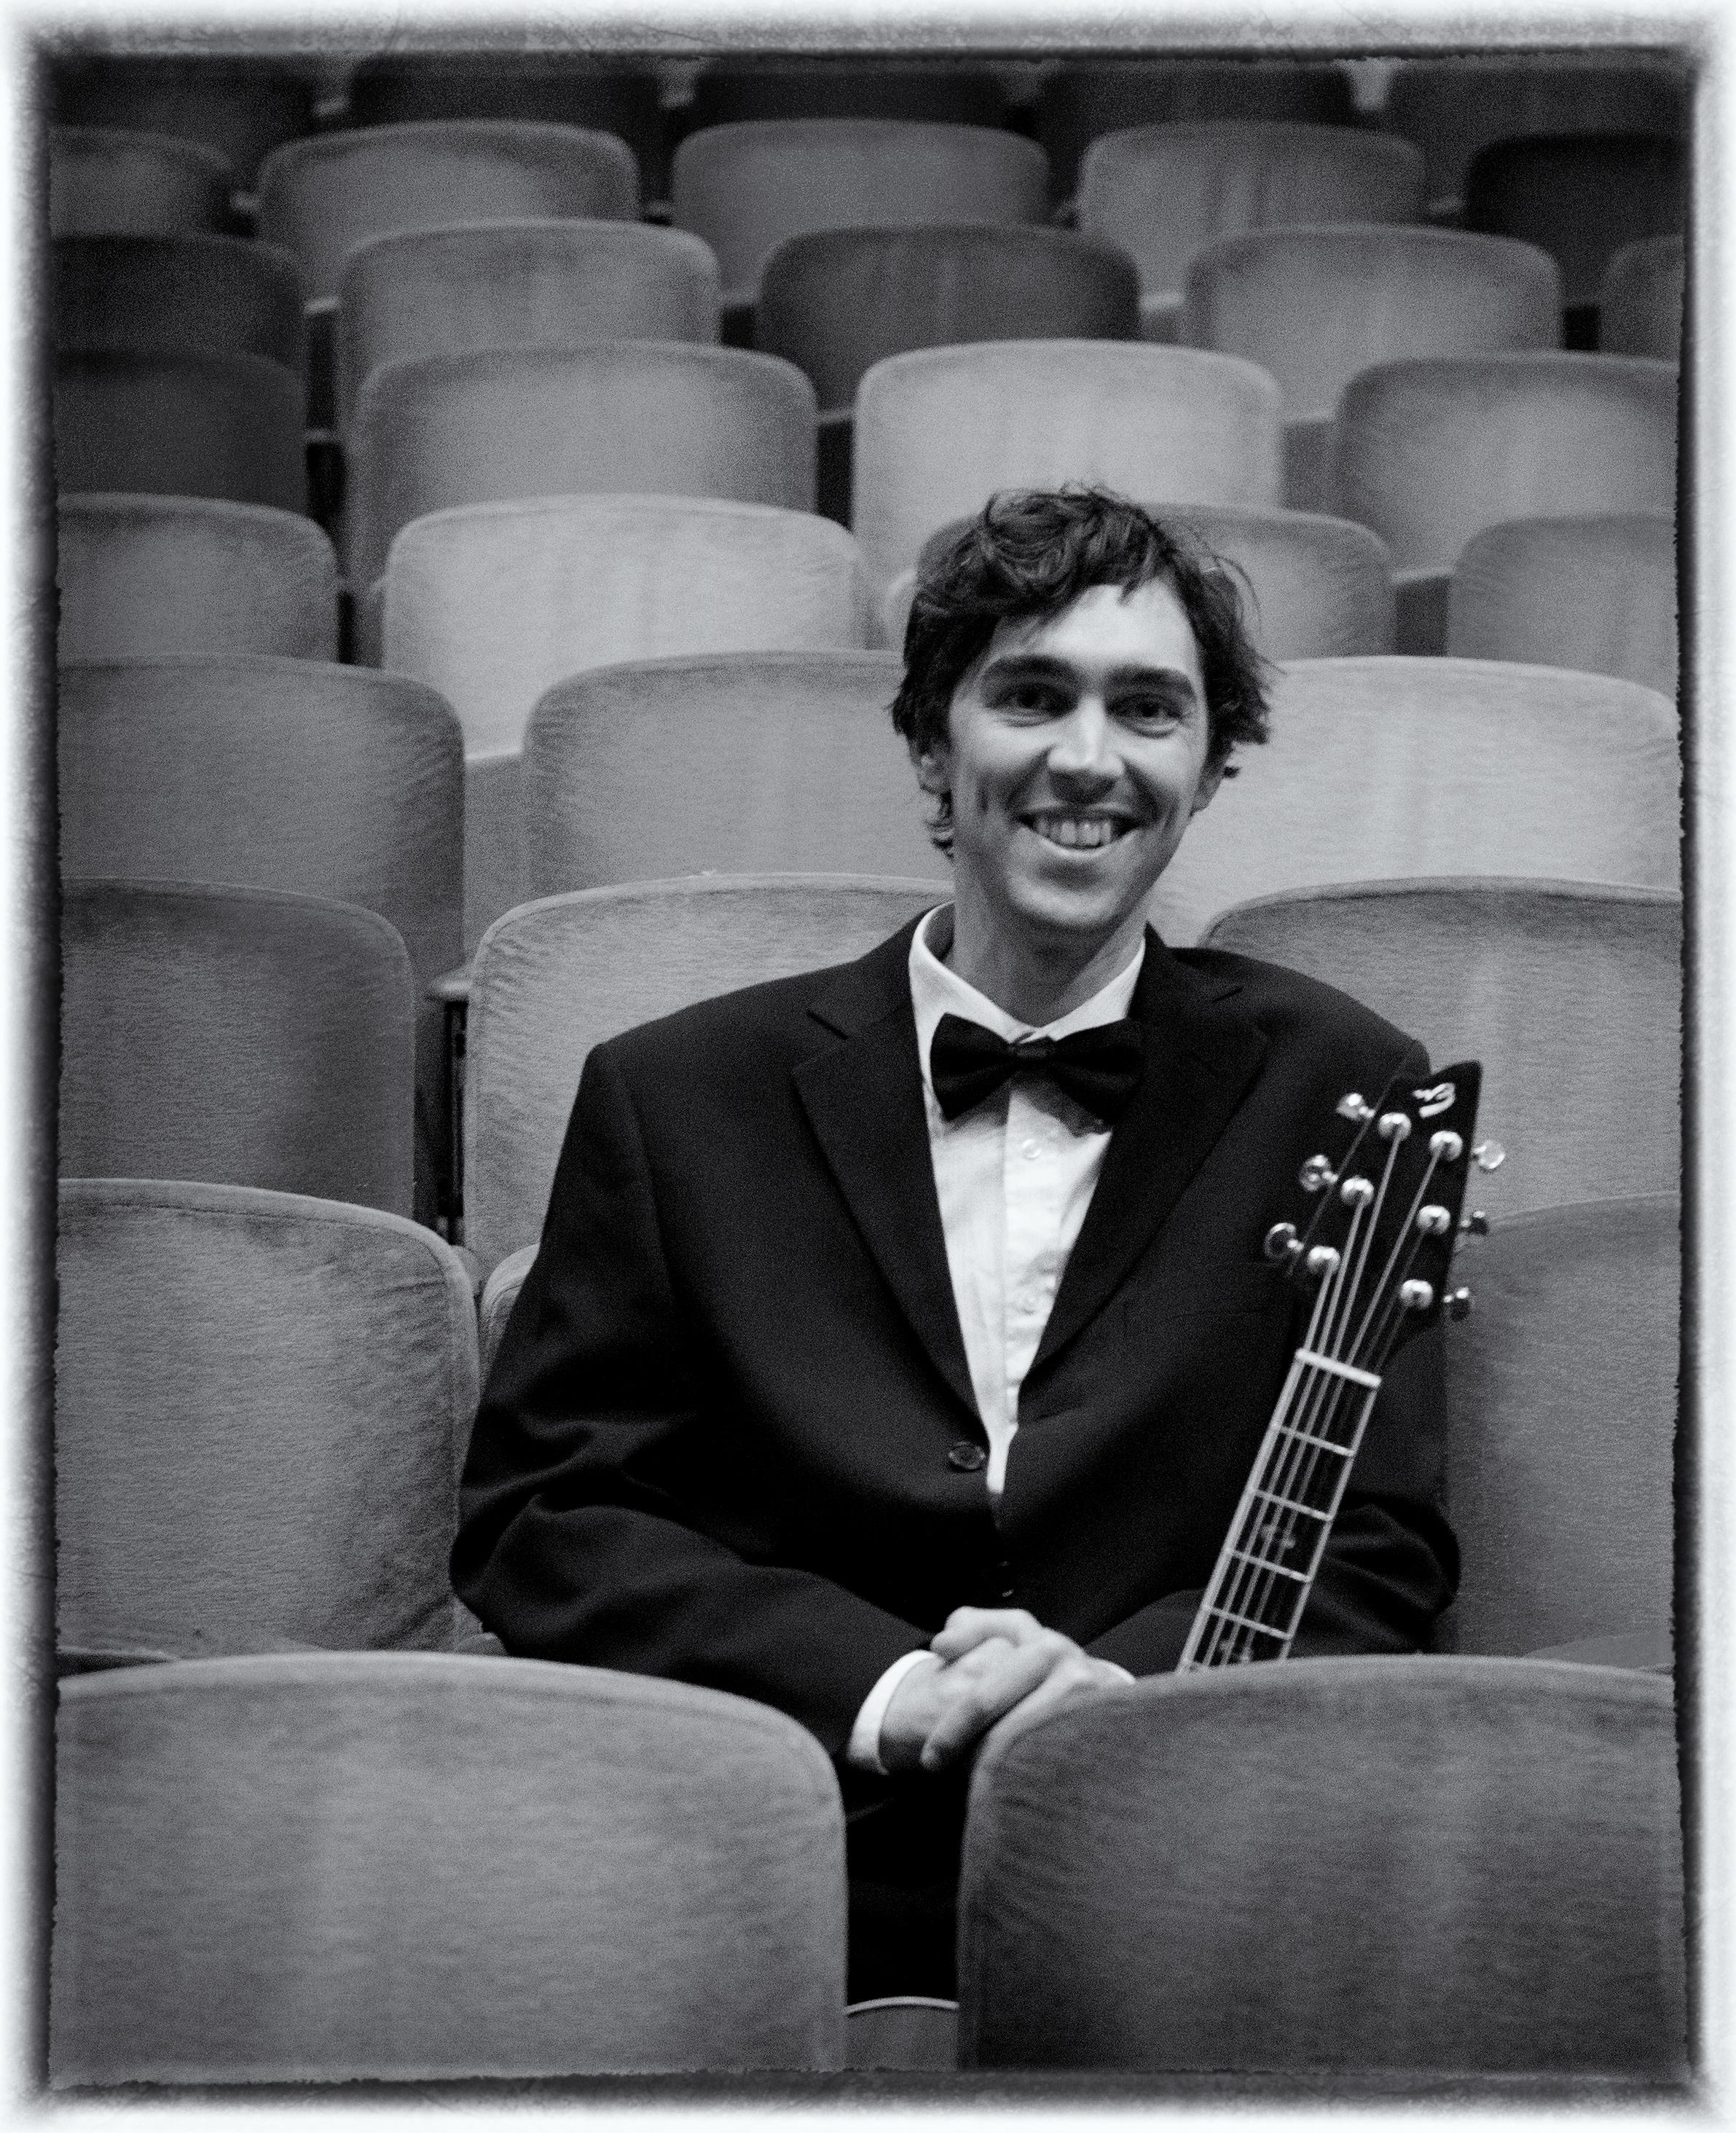 Owen Feeney - Guitars